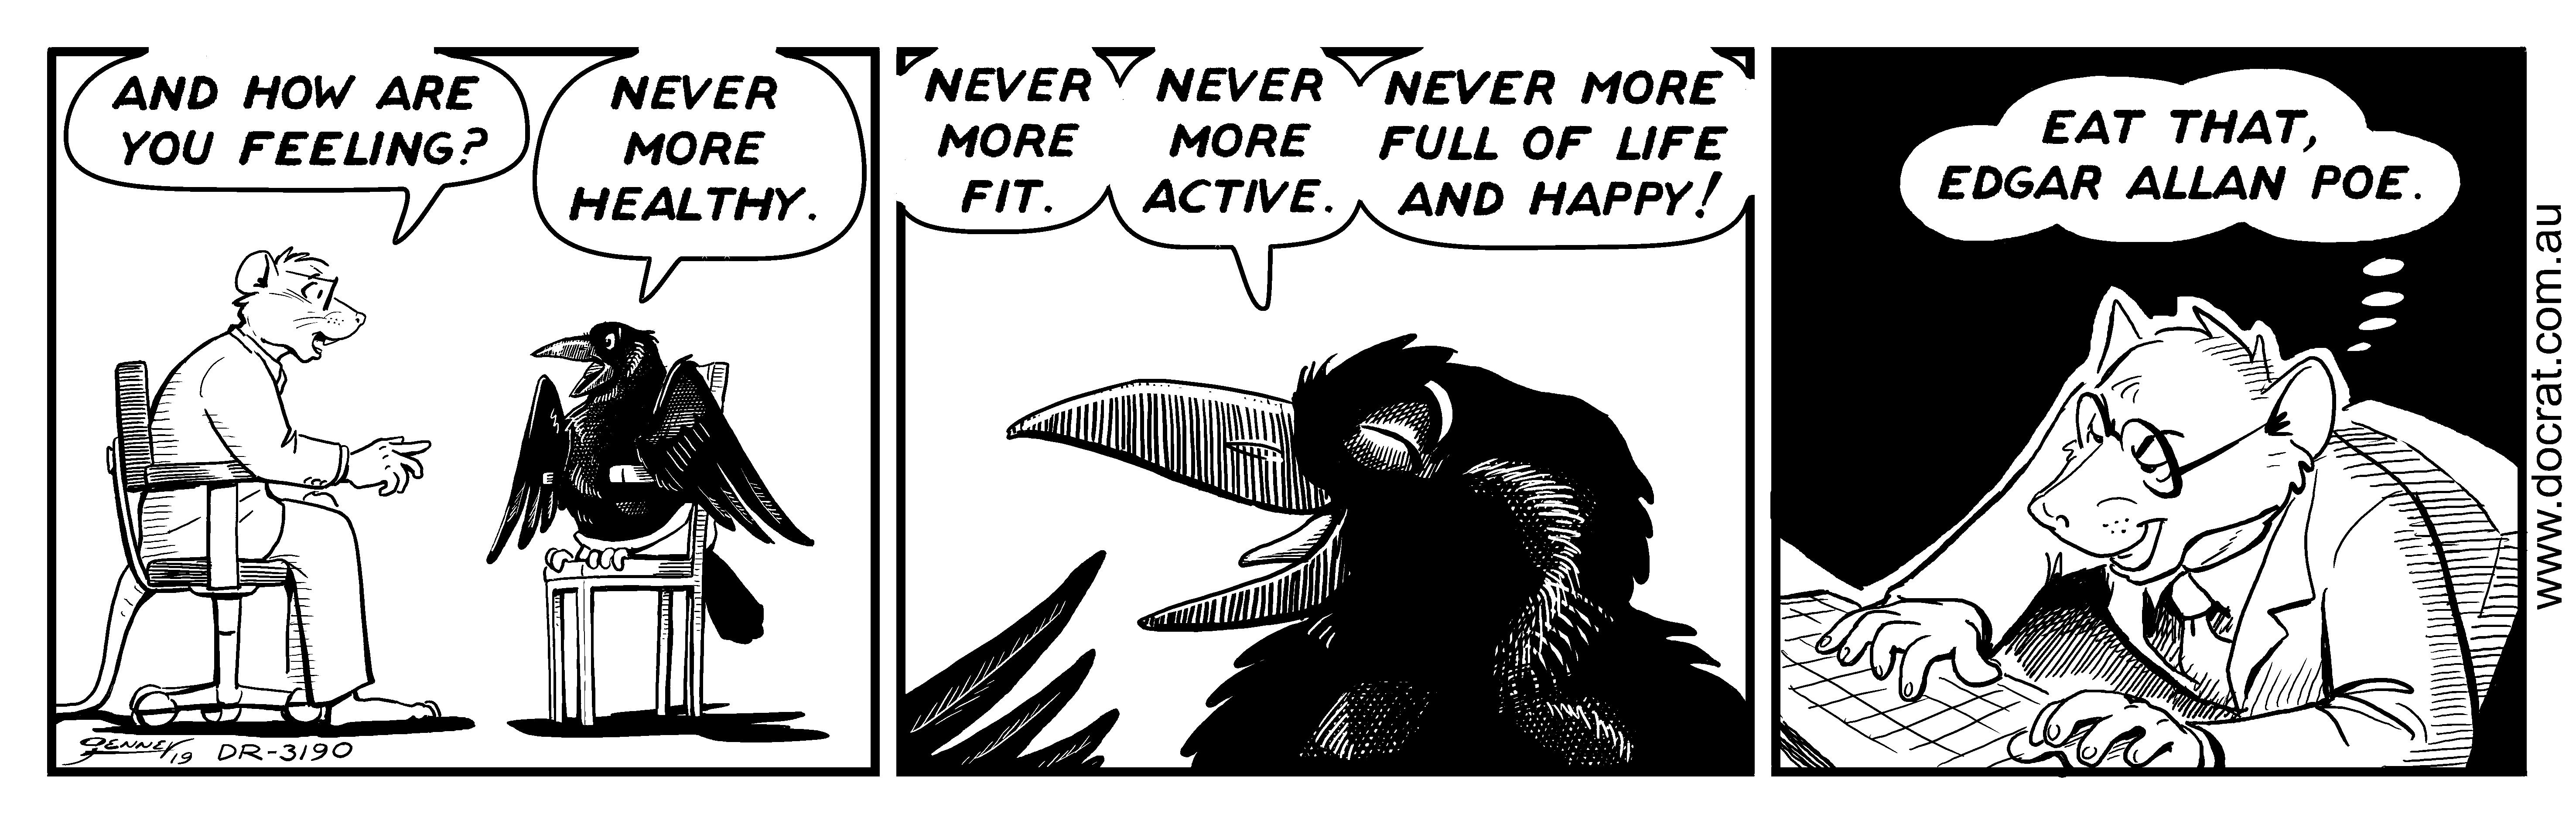 20190301